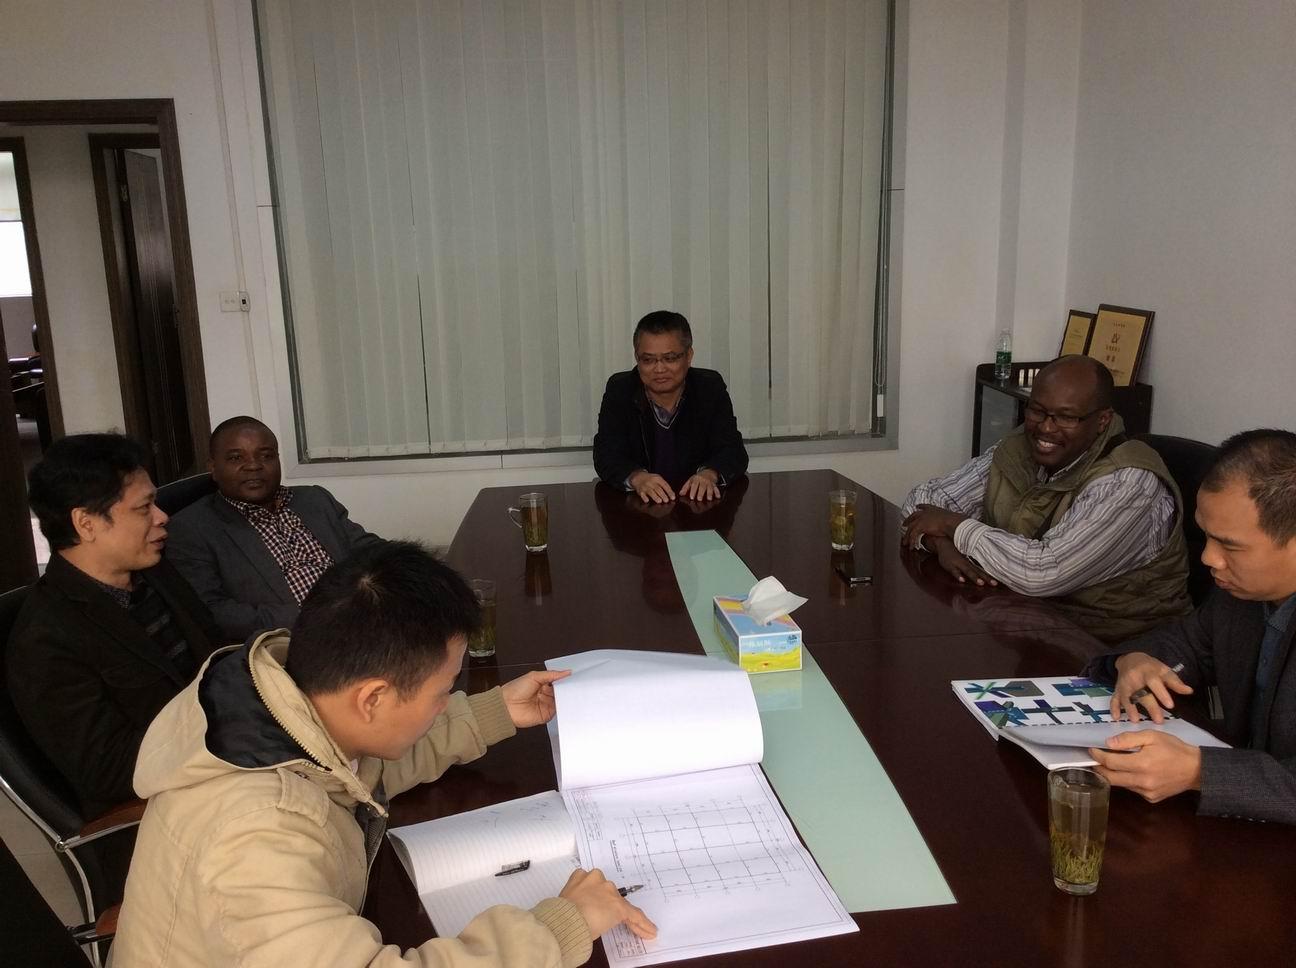 Burundi clients visiting